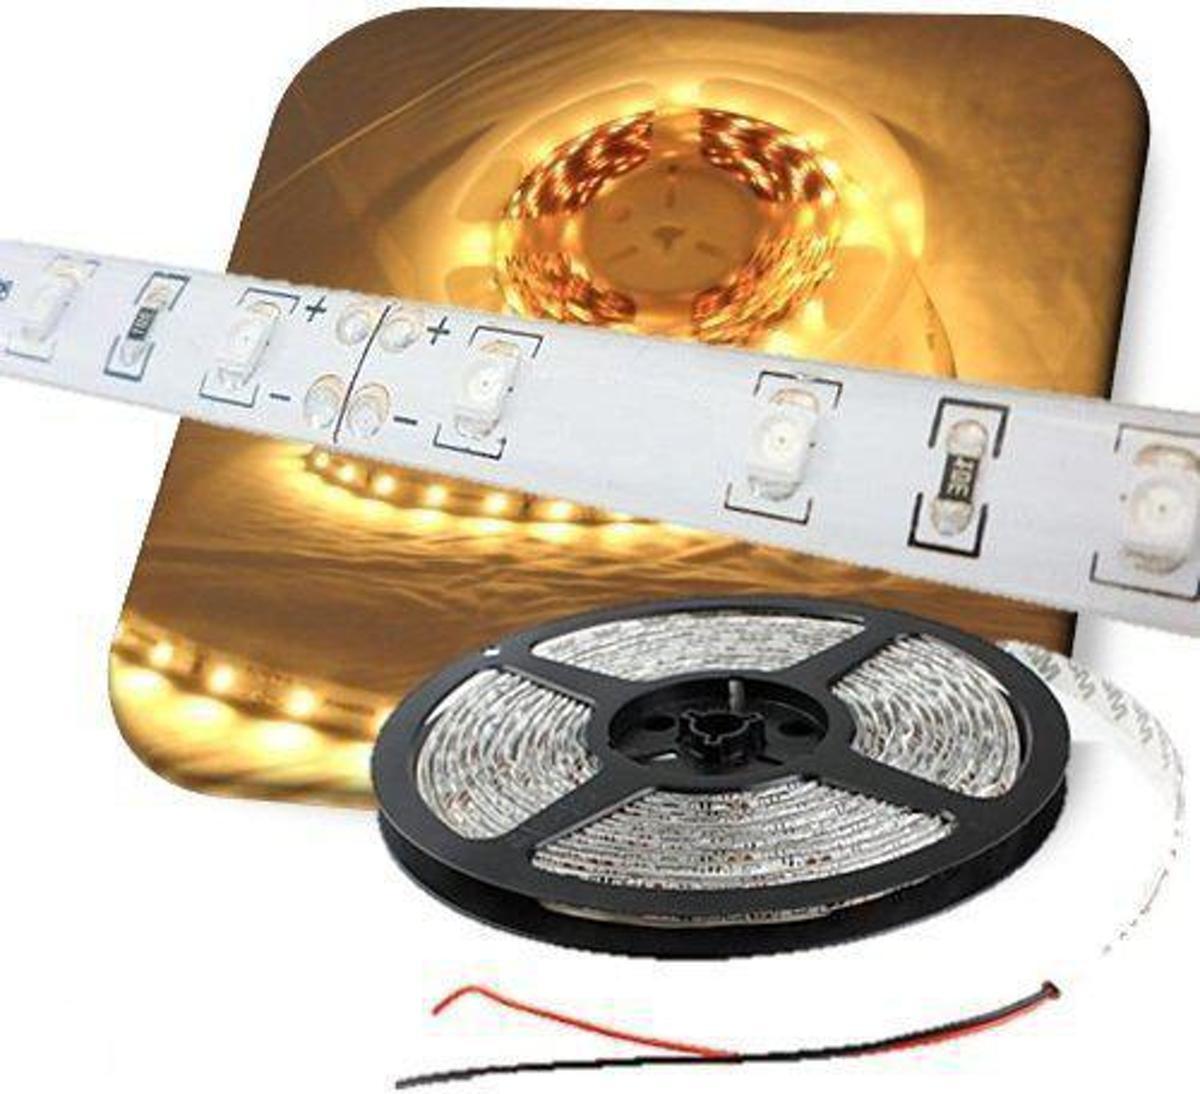 LEDstrip WARM WIT 5-meter 60 leds/meter waterproof LED strip kopen